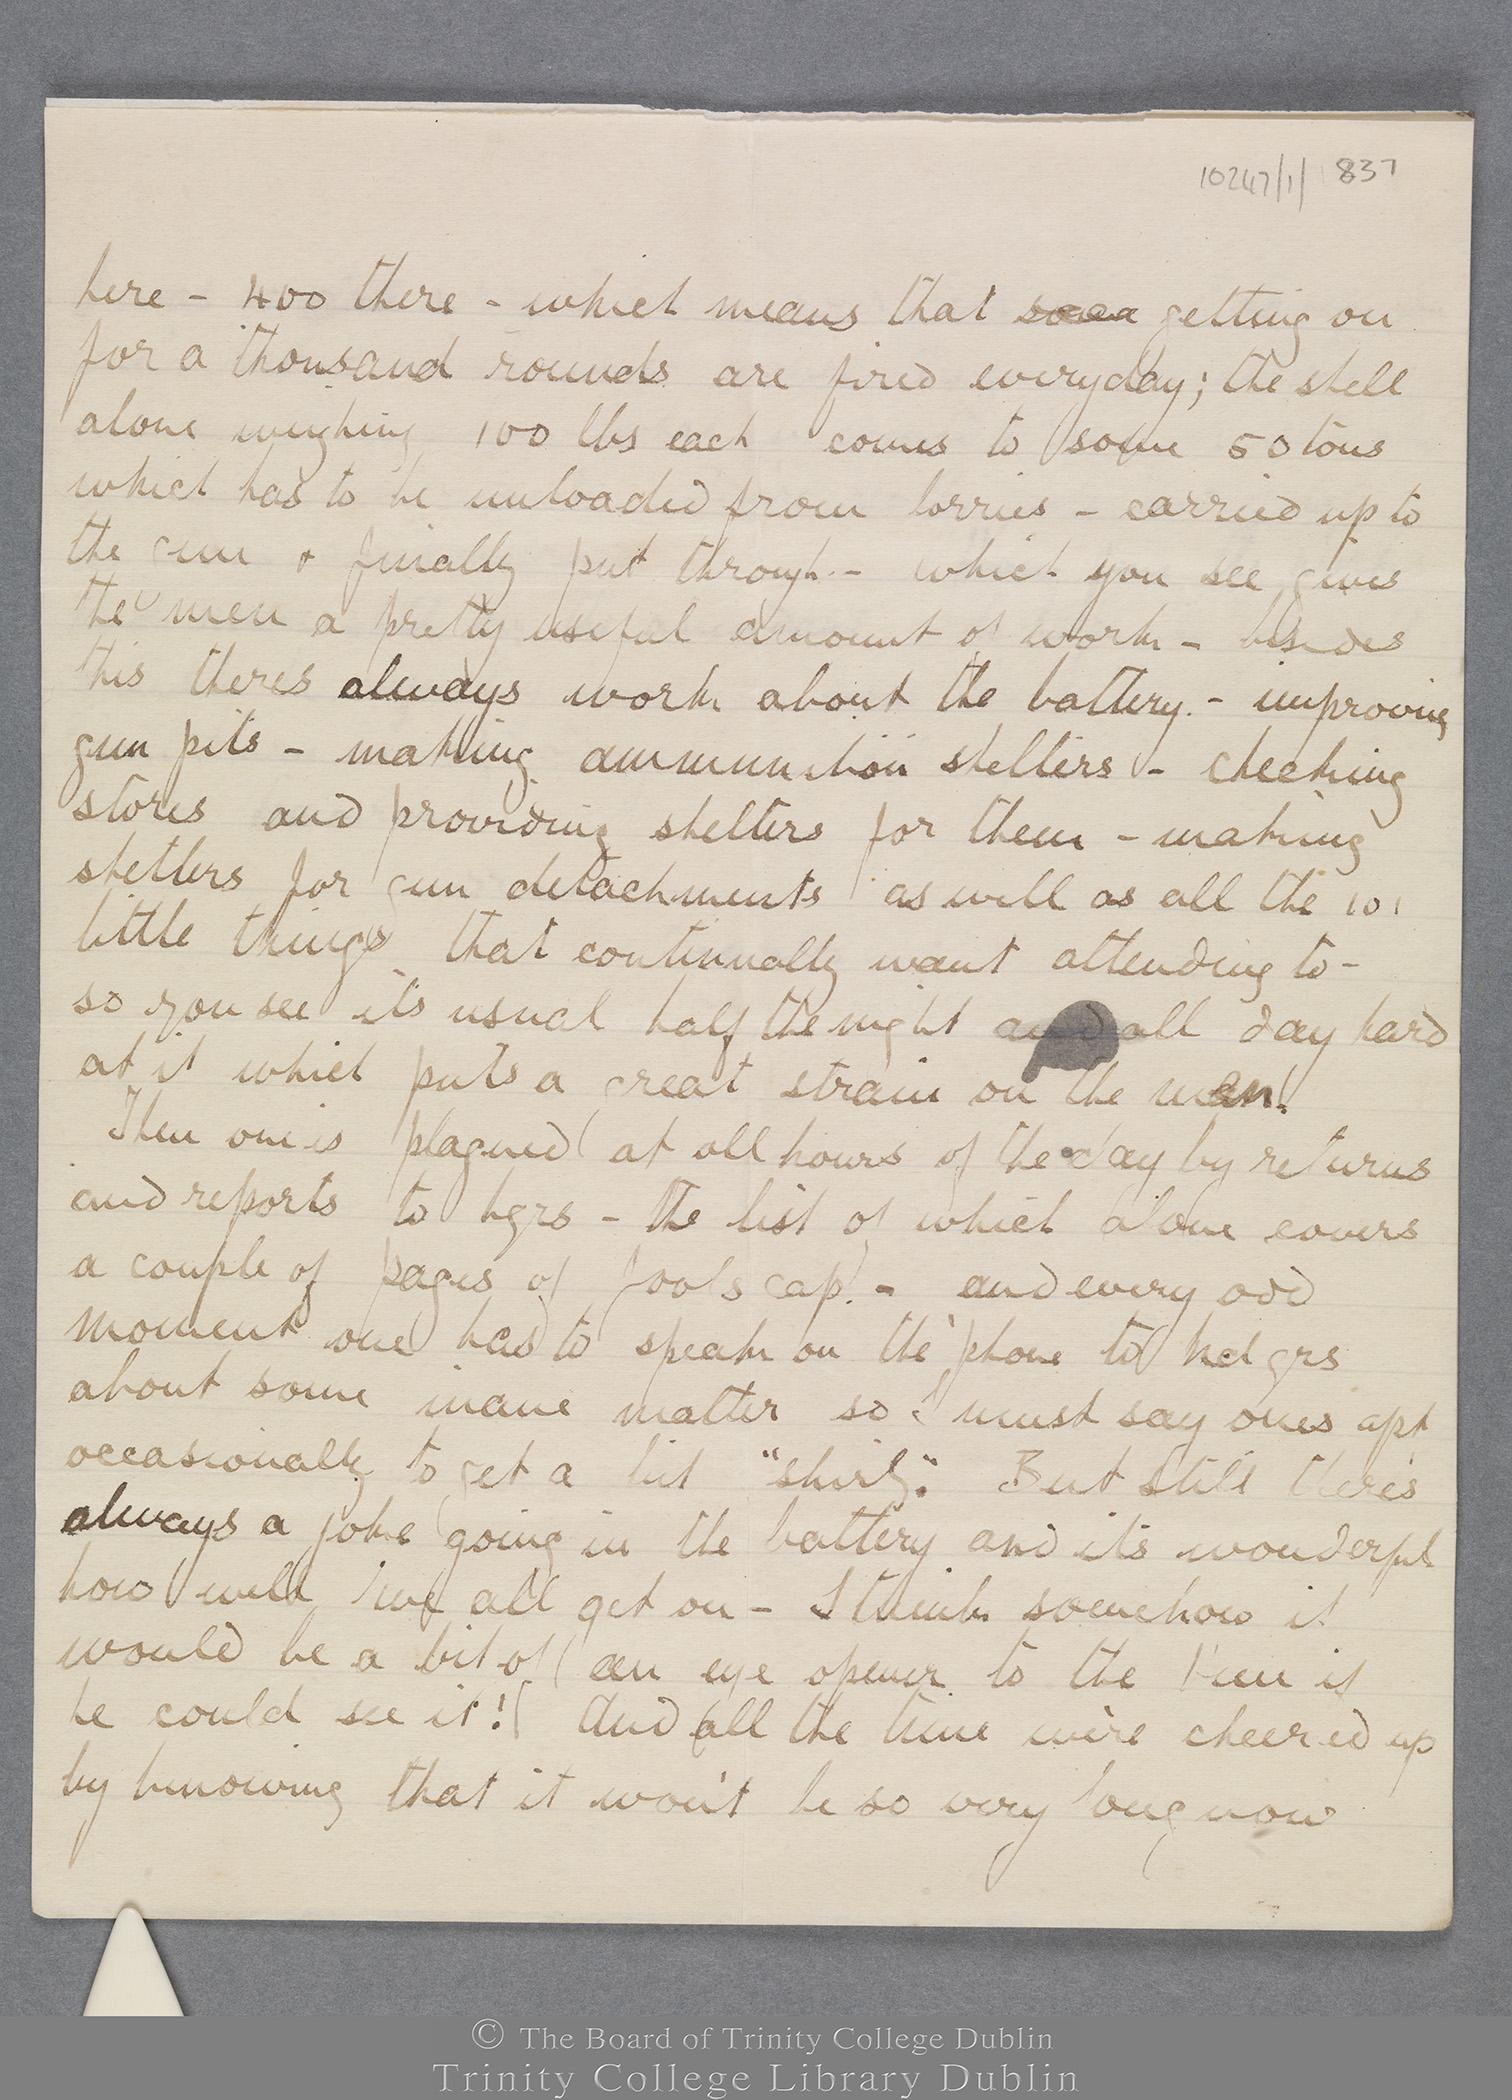 TCD MS 10247/1/837 folio 2 recto